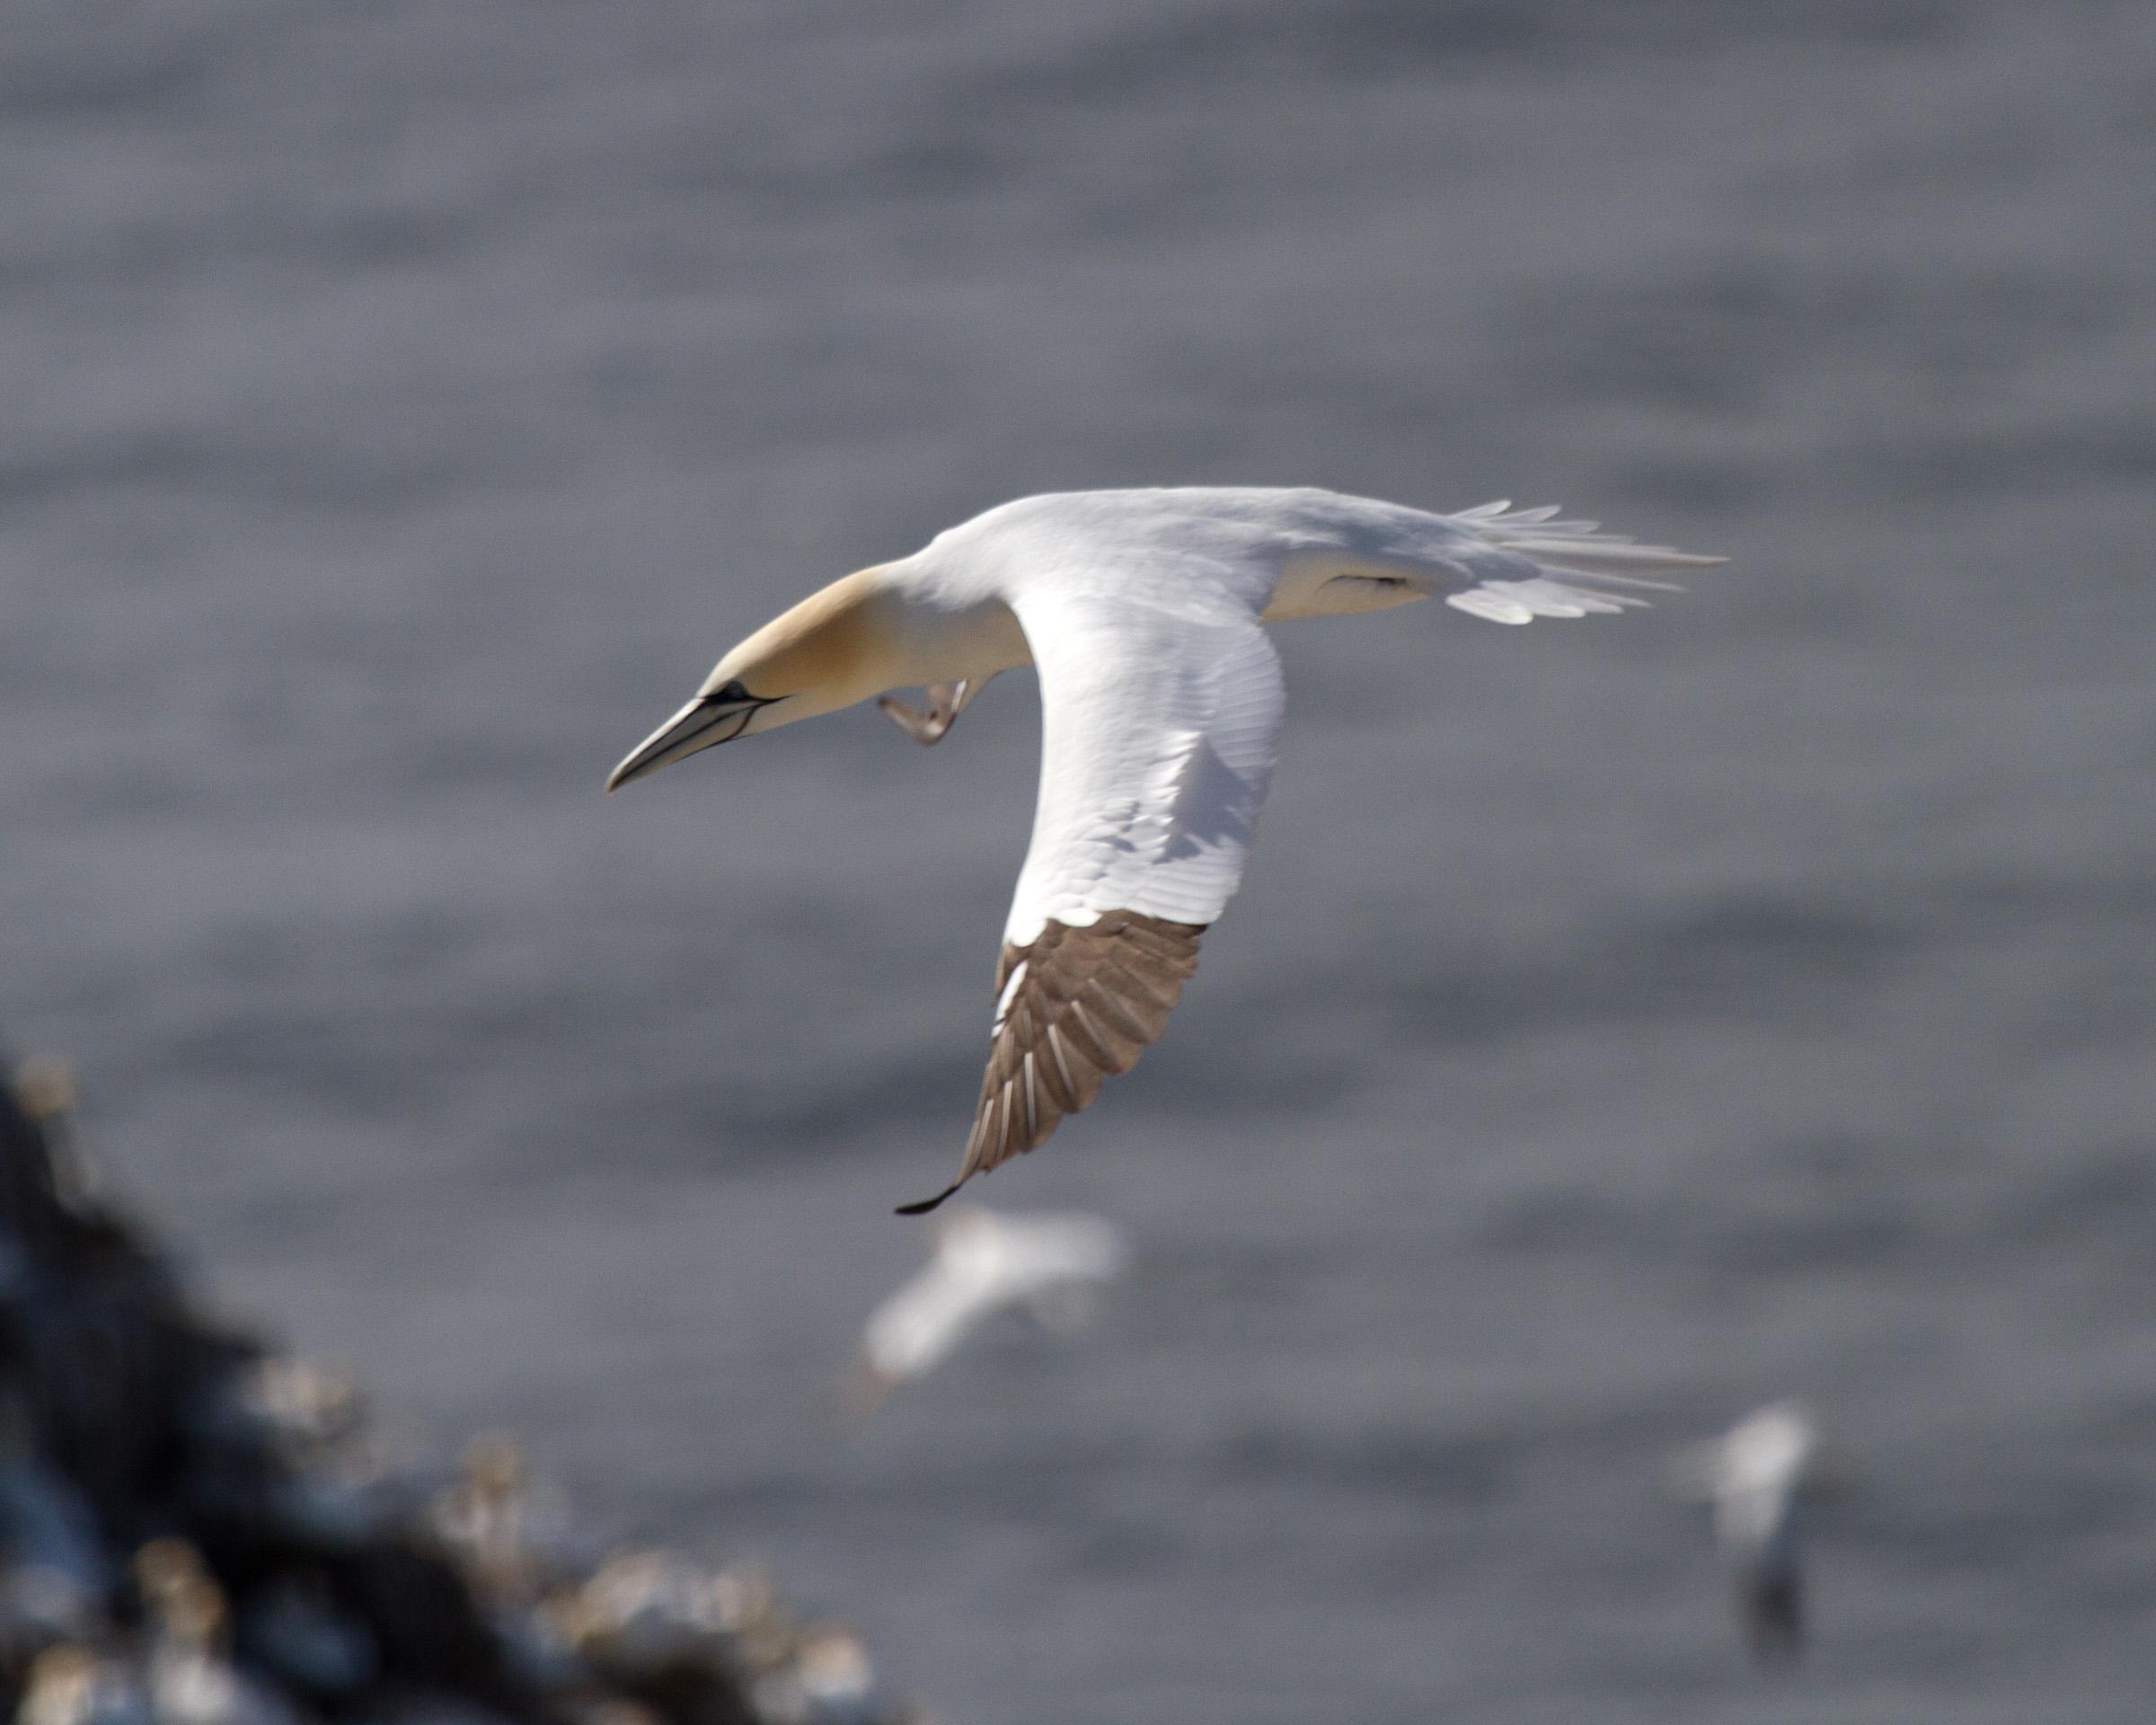 Gannet Flying, Animal, Plumage, Mating, Morus, HQ Photo